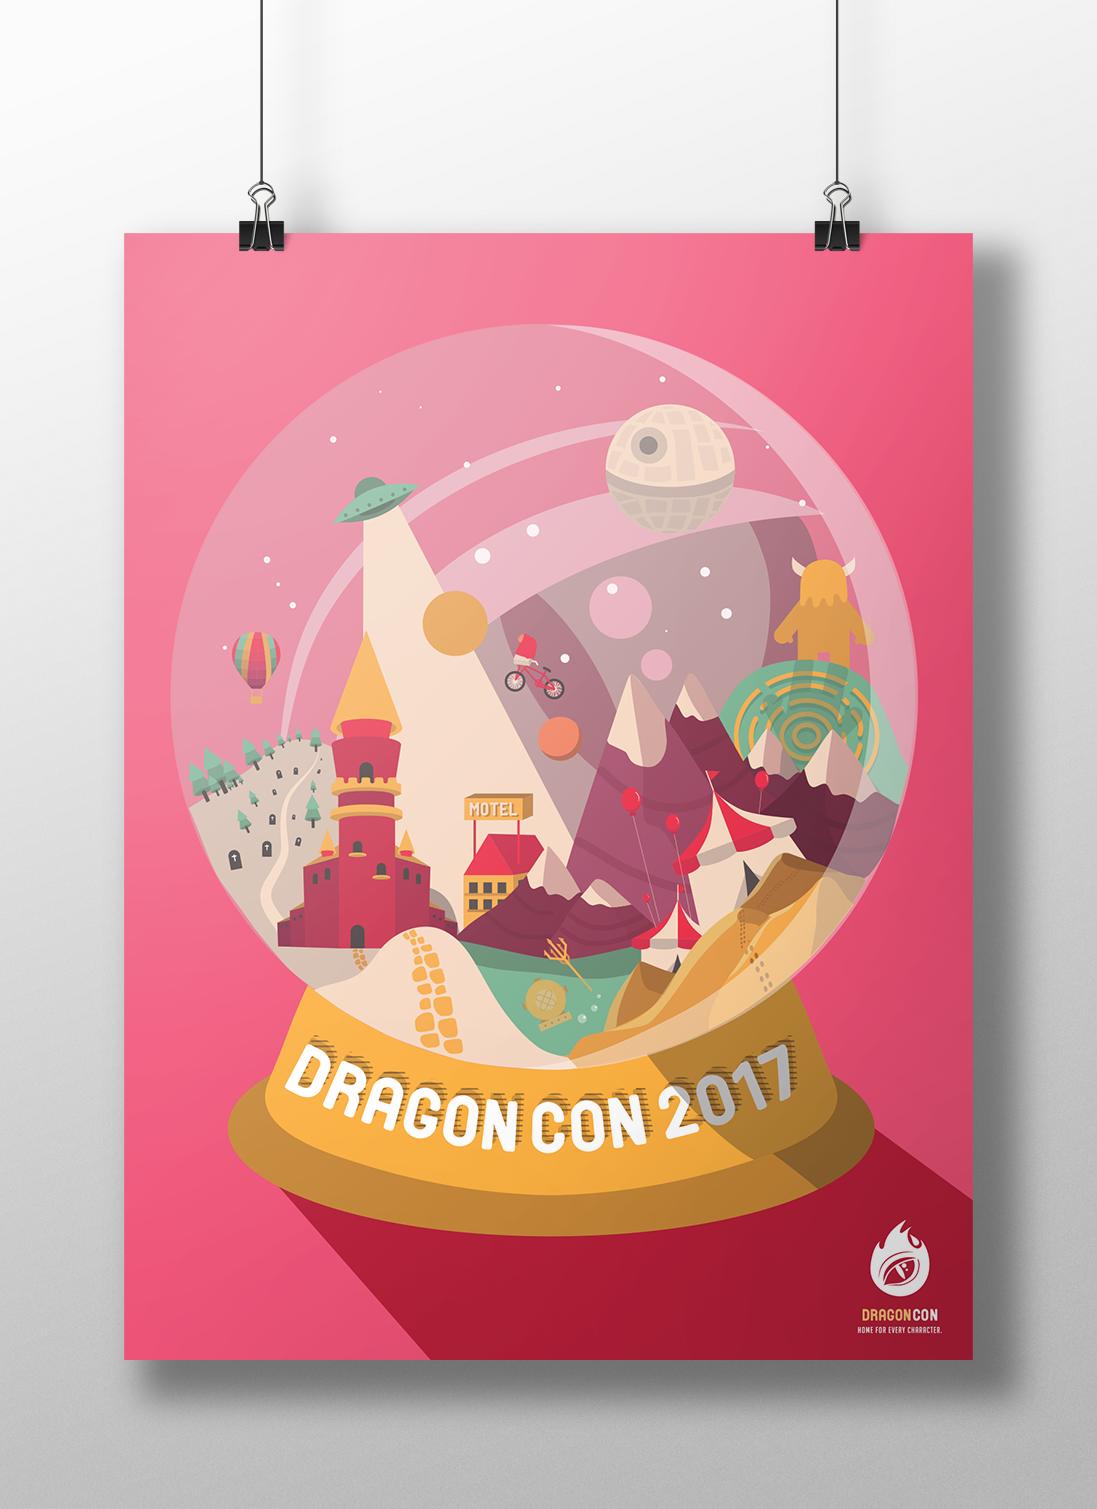 DragonConPosterMockup.png